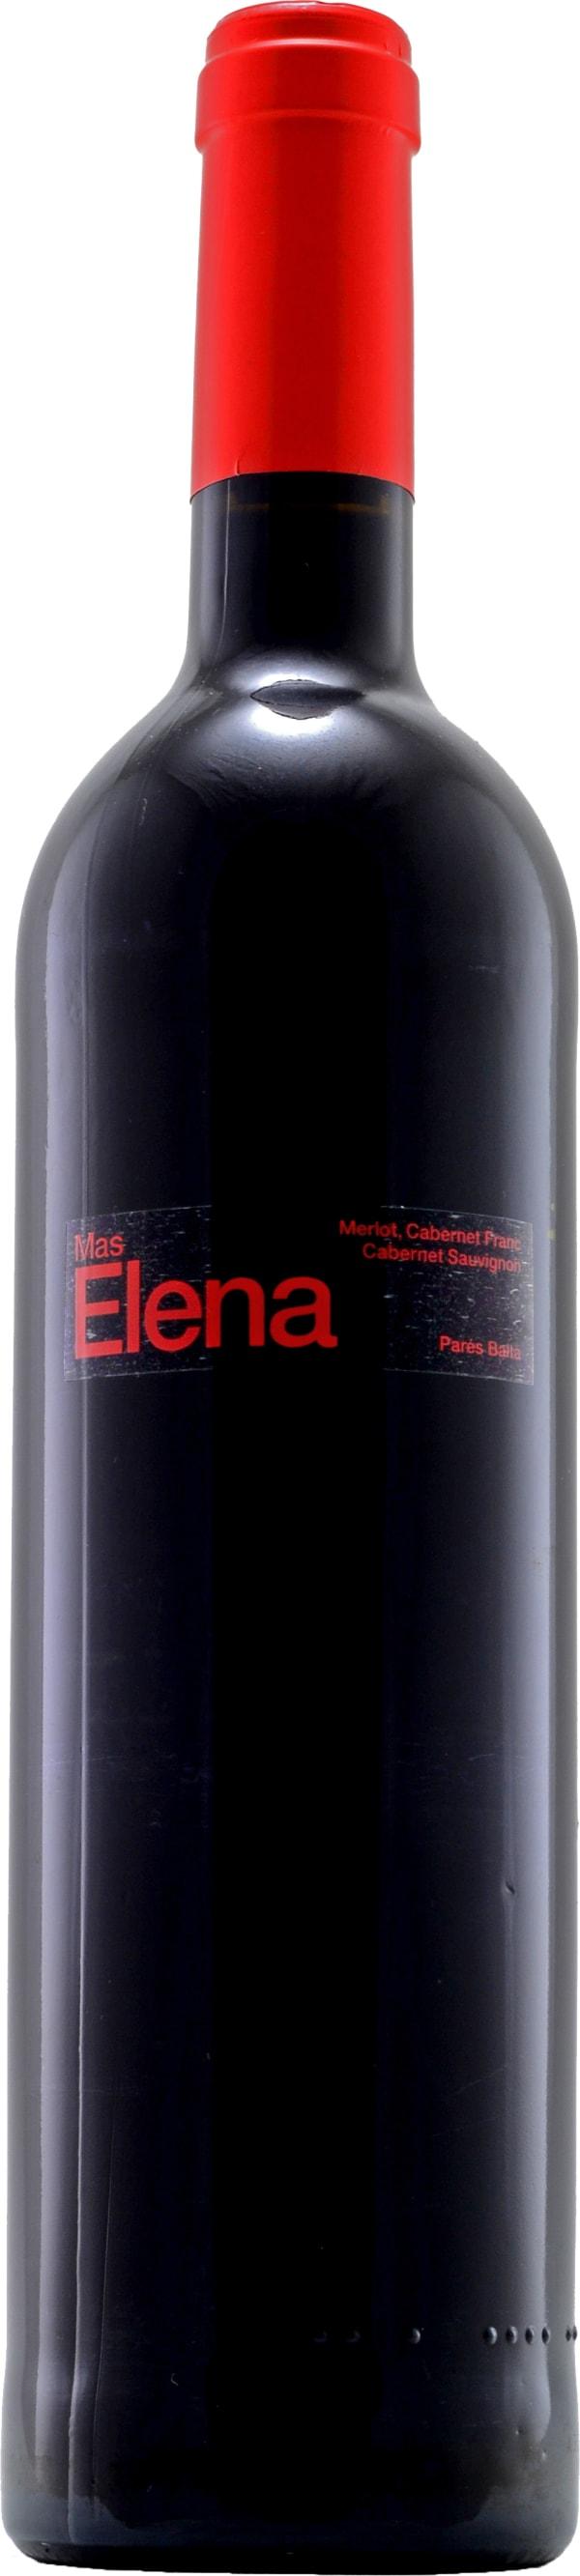 Mas Elena 2013